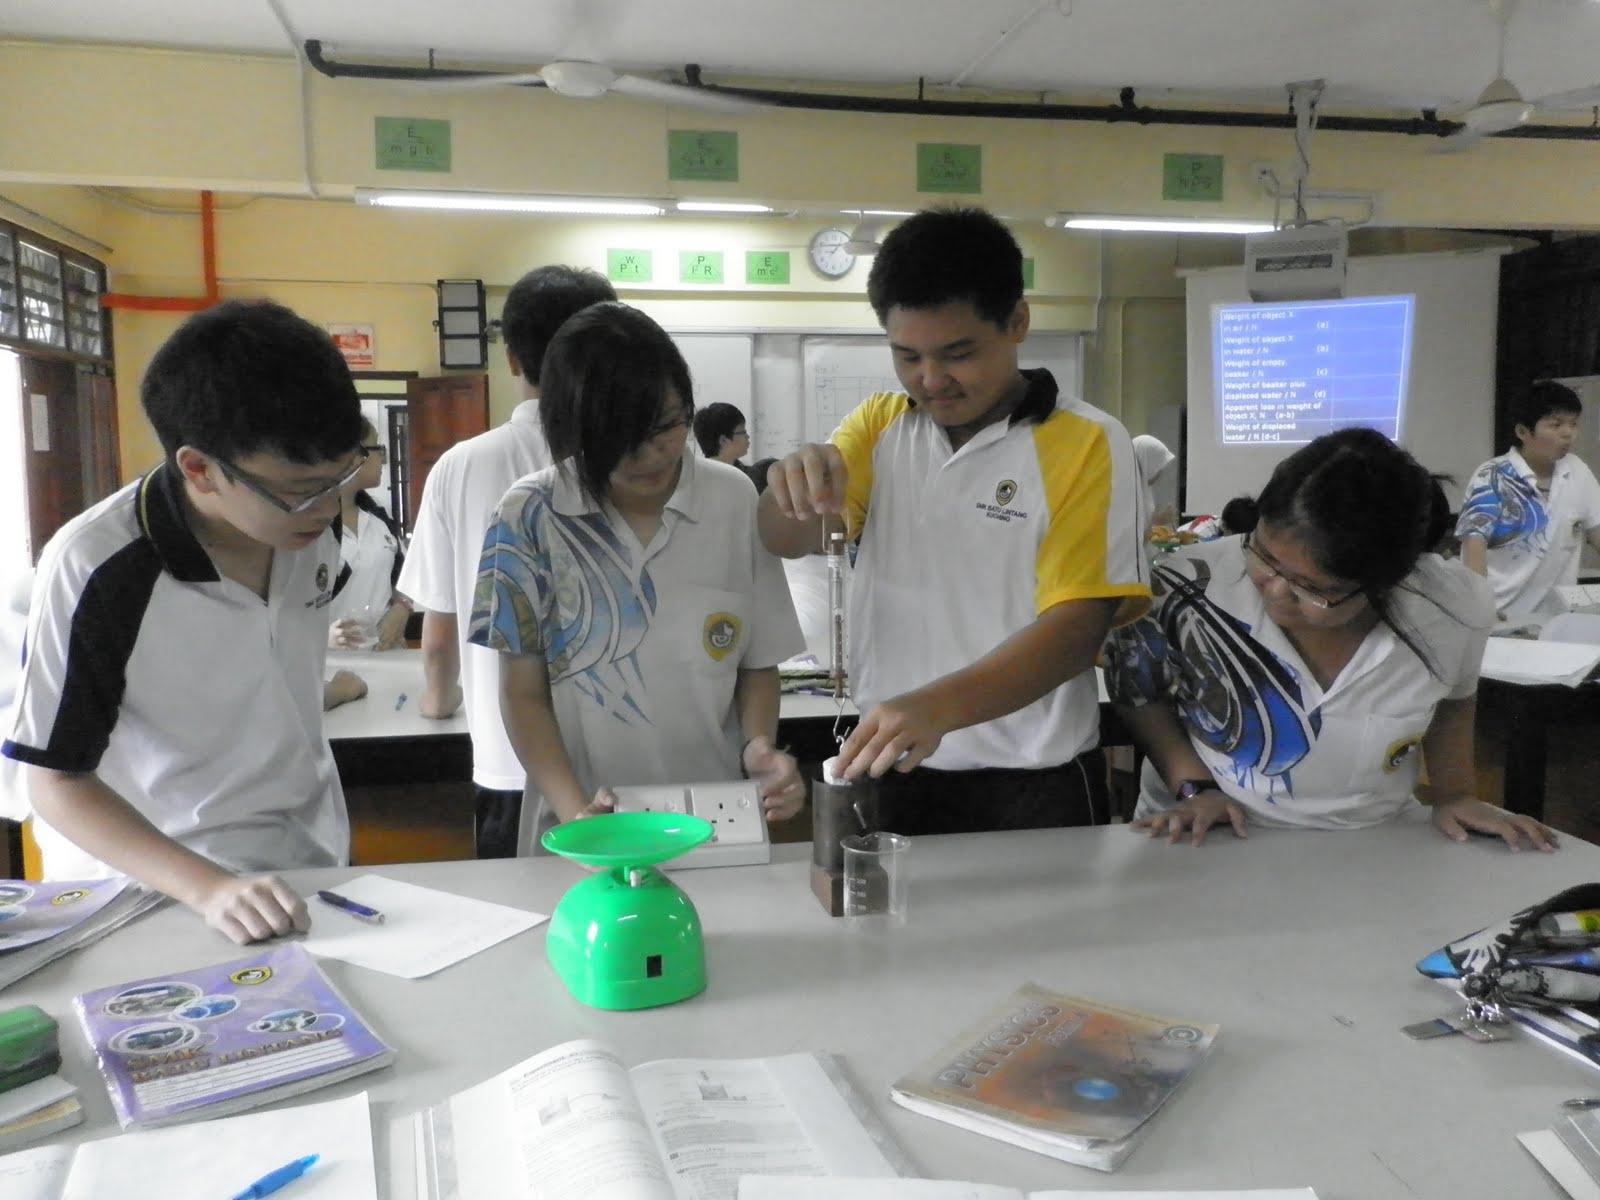 My Fun Physics World Fun With Archimedes Principle